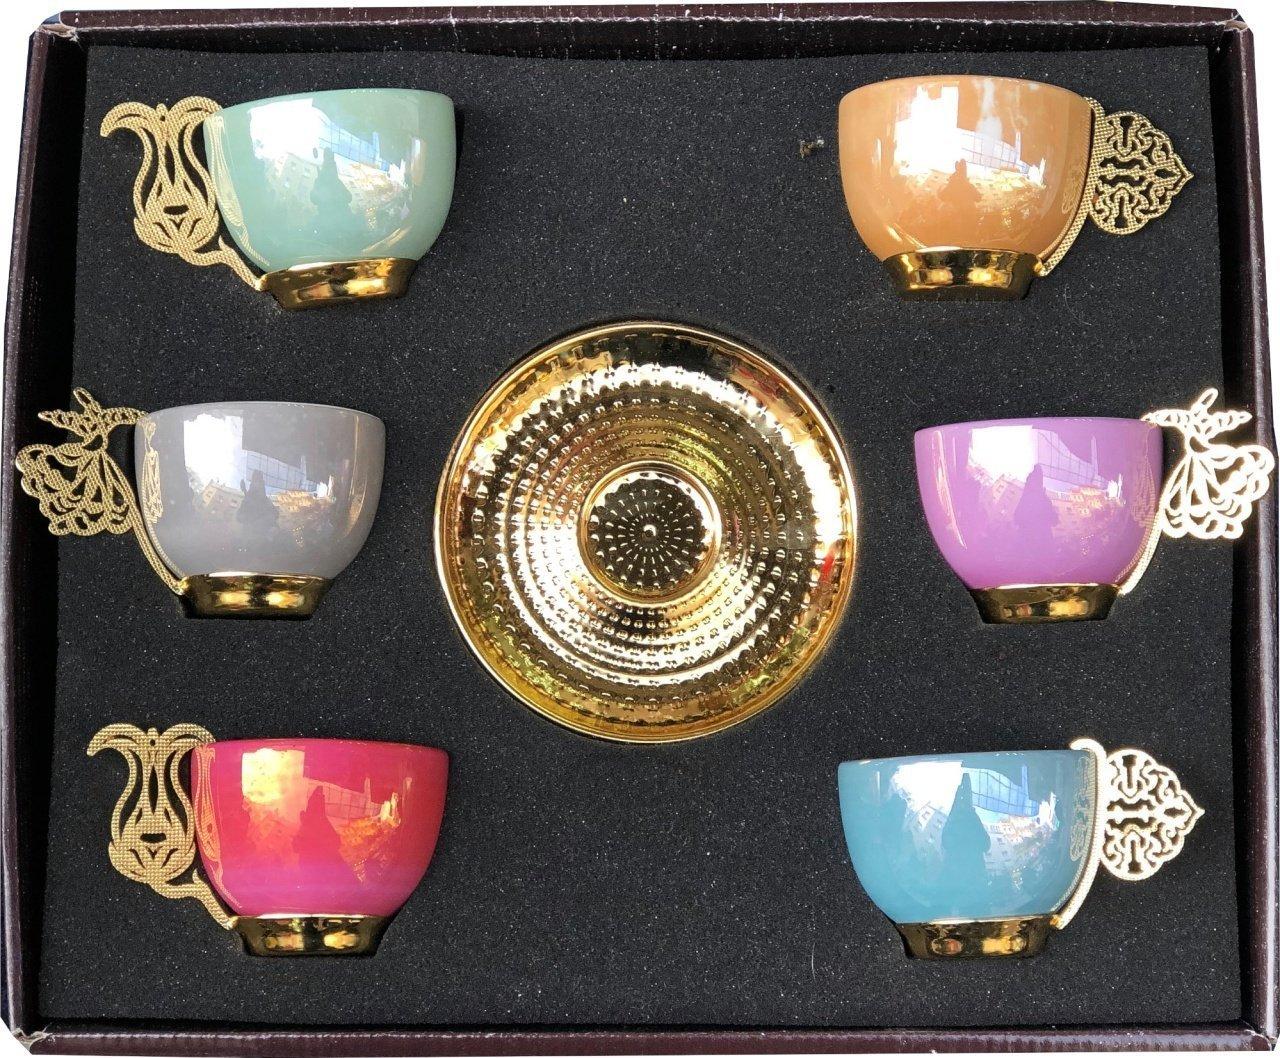 12 PC Traditional Turkish Coffee Espresso Tea Porcelain Serving Cup Saucer (Multi Color)